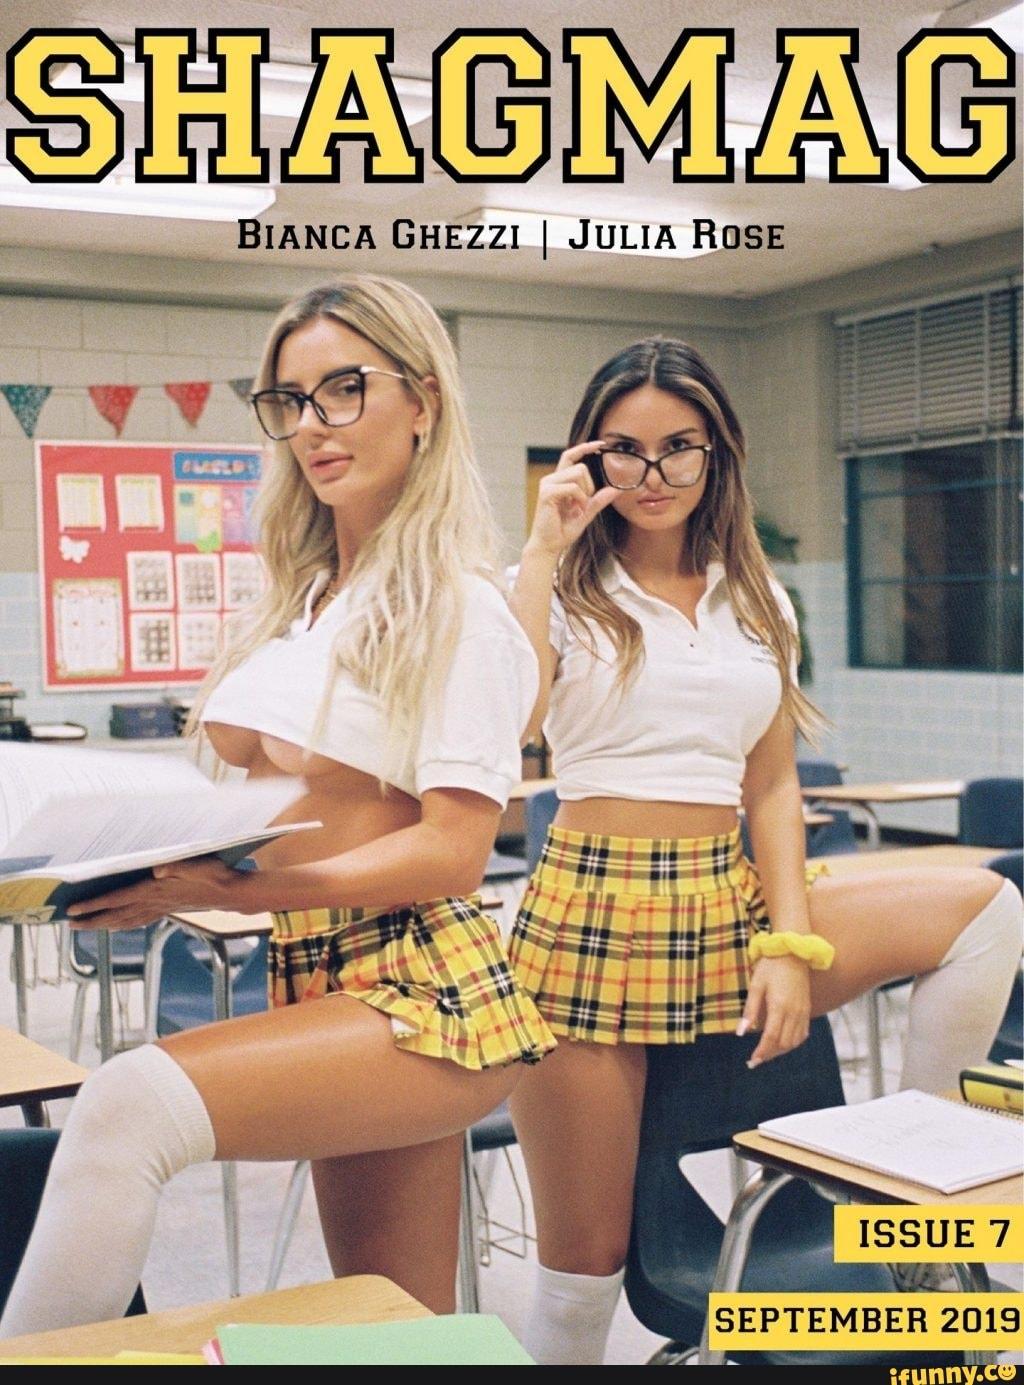 Bianca Ghe 221 I Julia Rose Ifunny Julia rose non si smentisce mai. bianca ghe 221 i julia rose ifunny